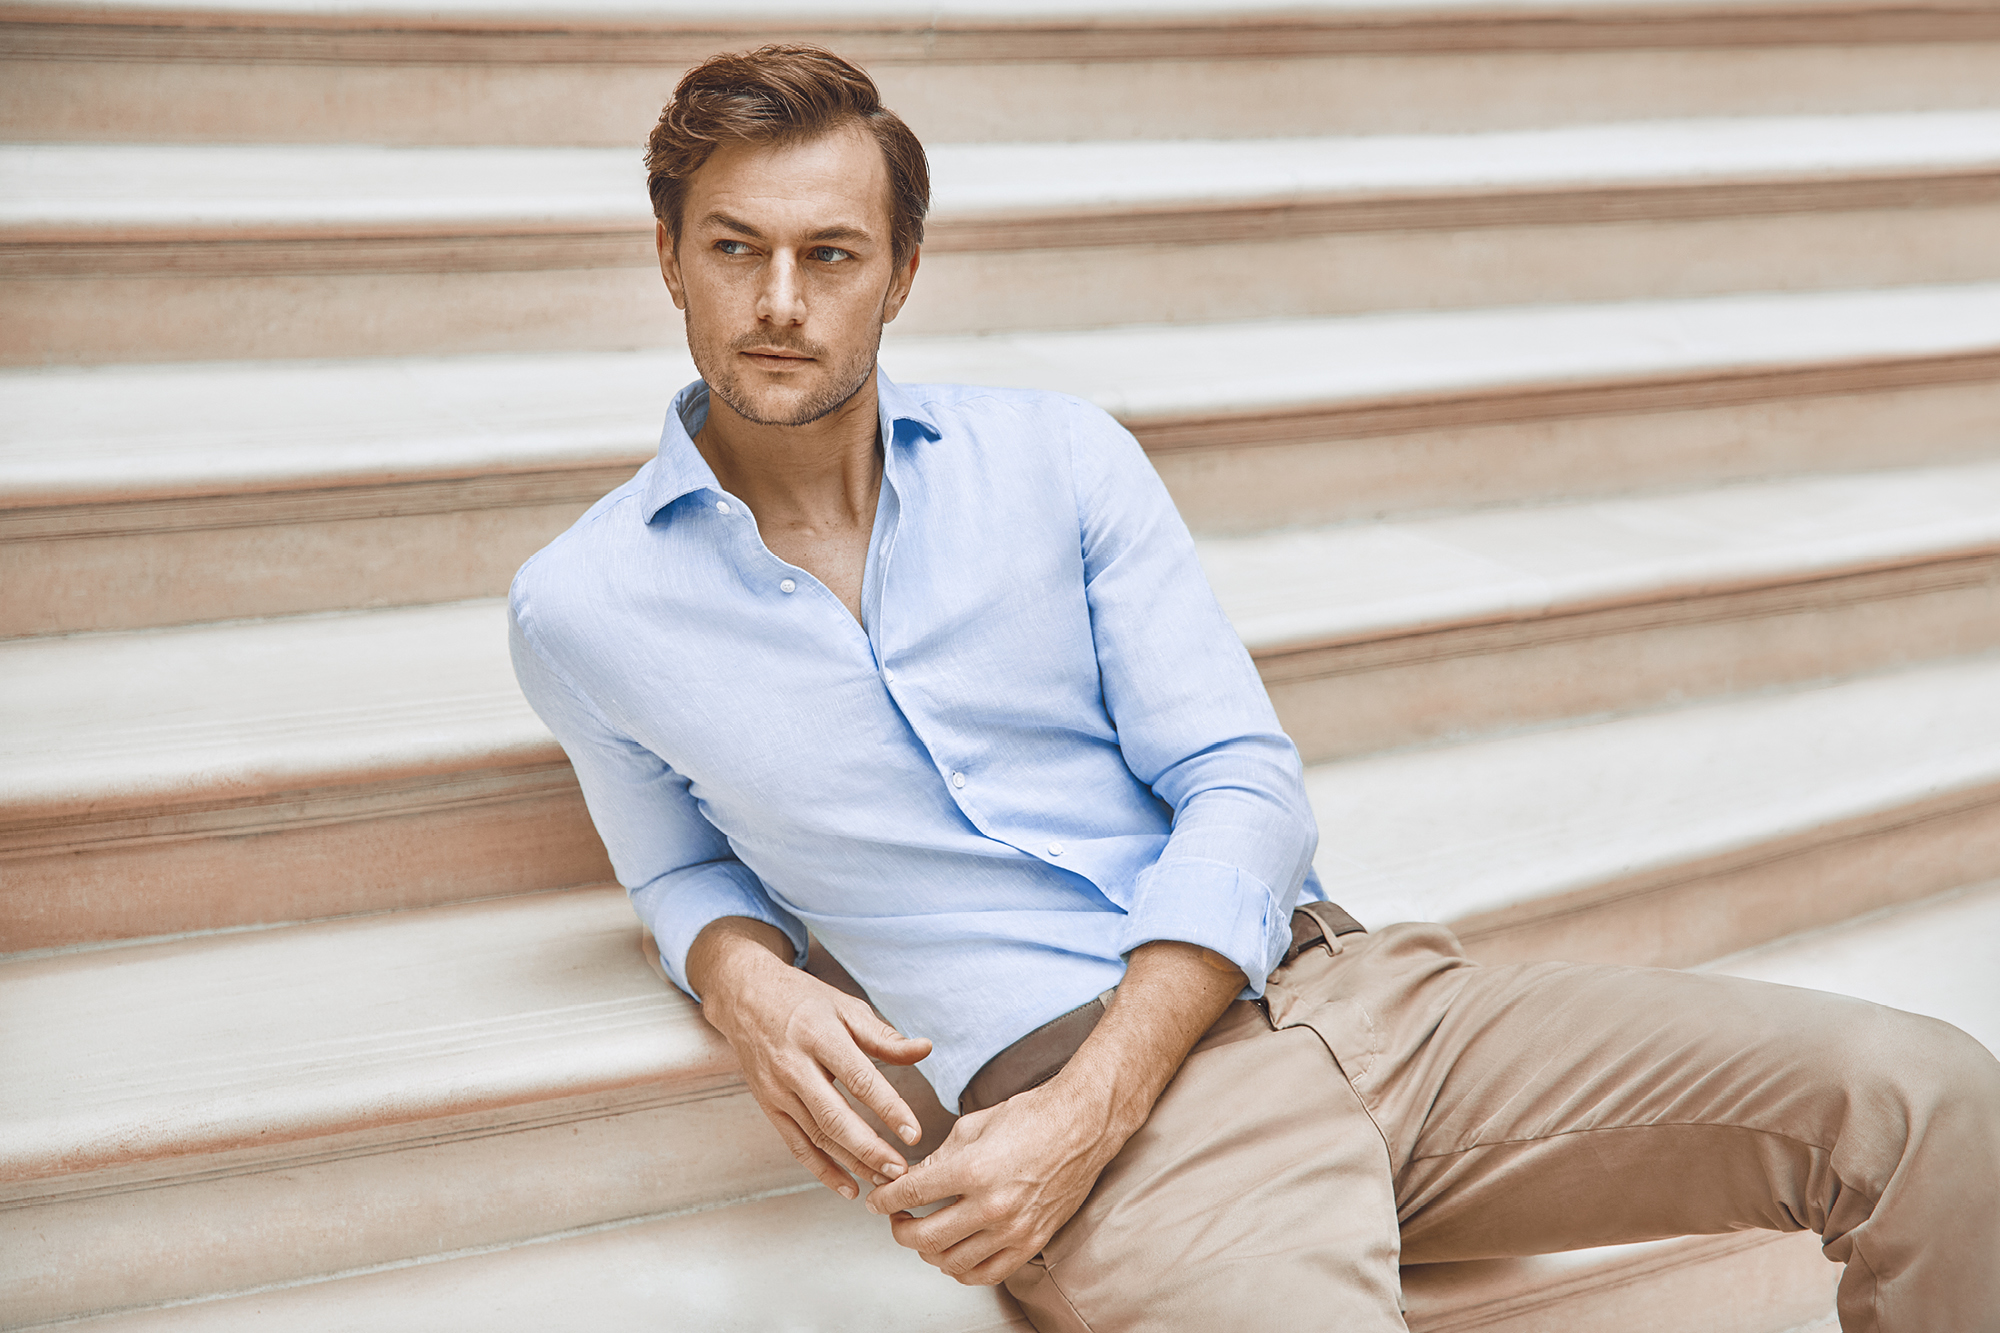 Luca Faloni Portofino linen shirt in sky blue, £140